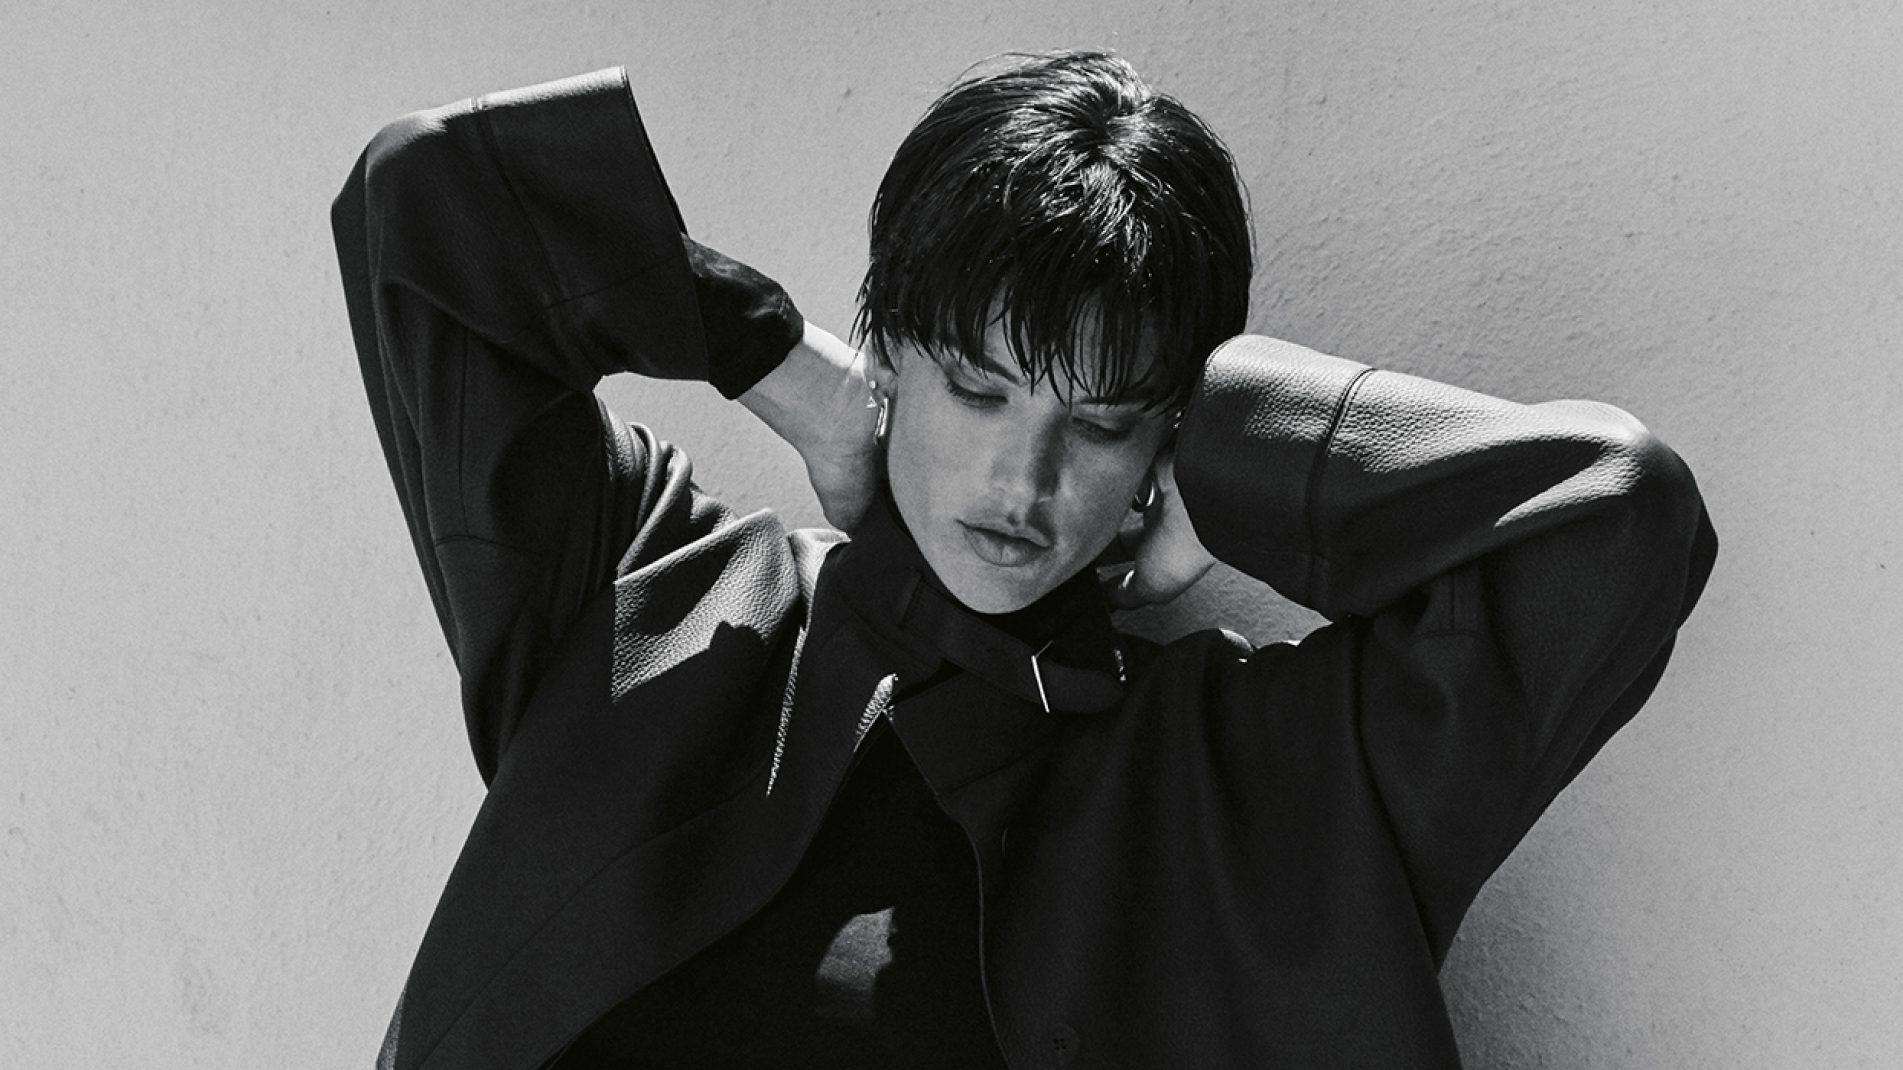 Alessandra Ambrosio | Photographer: Sonia Szóstak | Fashion Editor: Daniela Agnelli